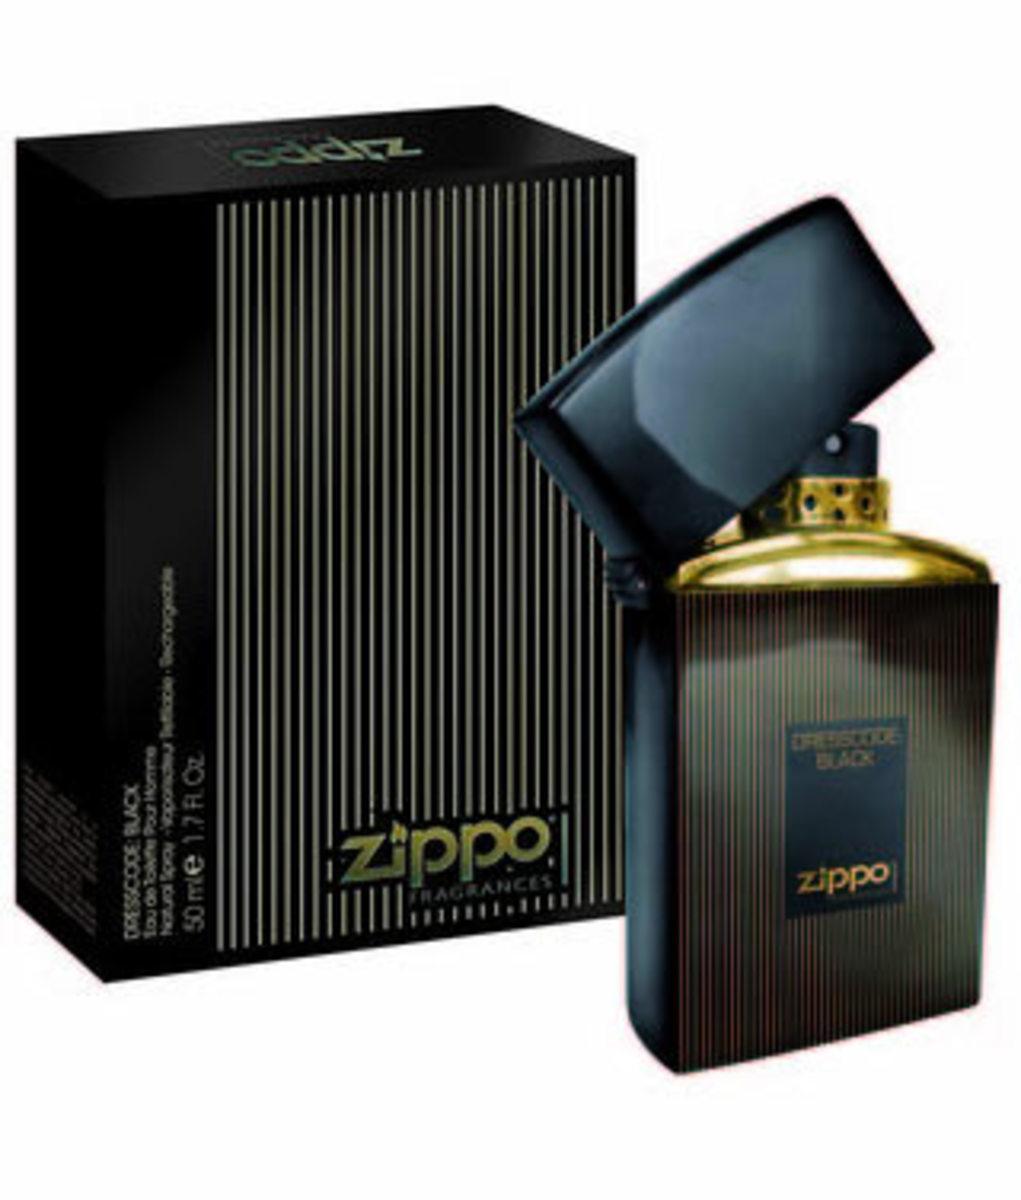 Zippo Dresscode Black by Zippo Fragrances